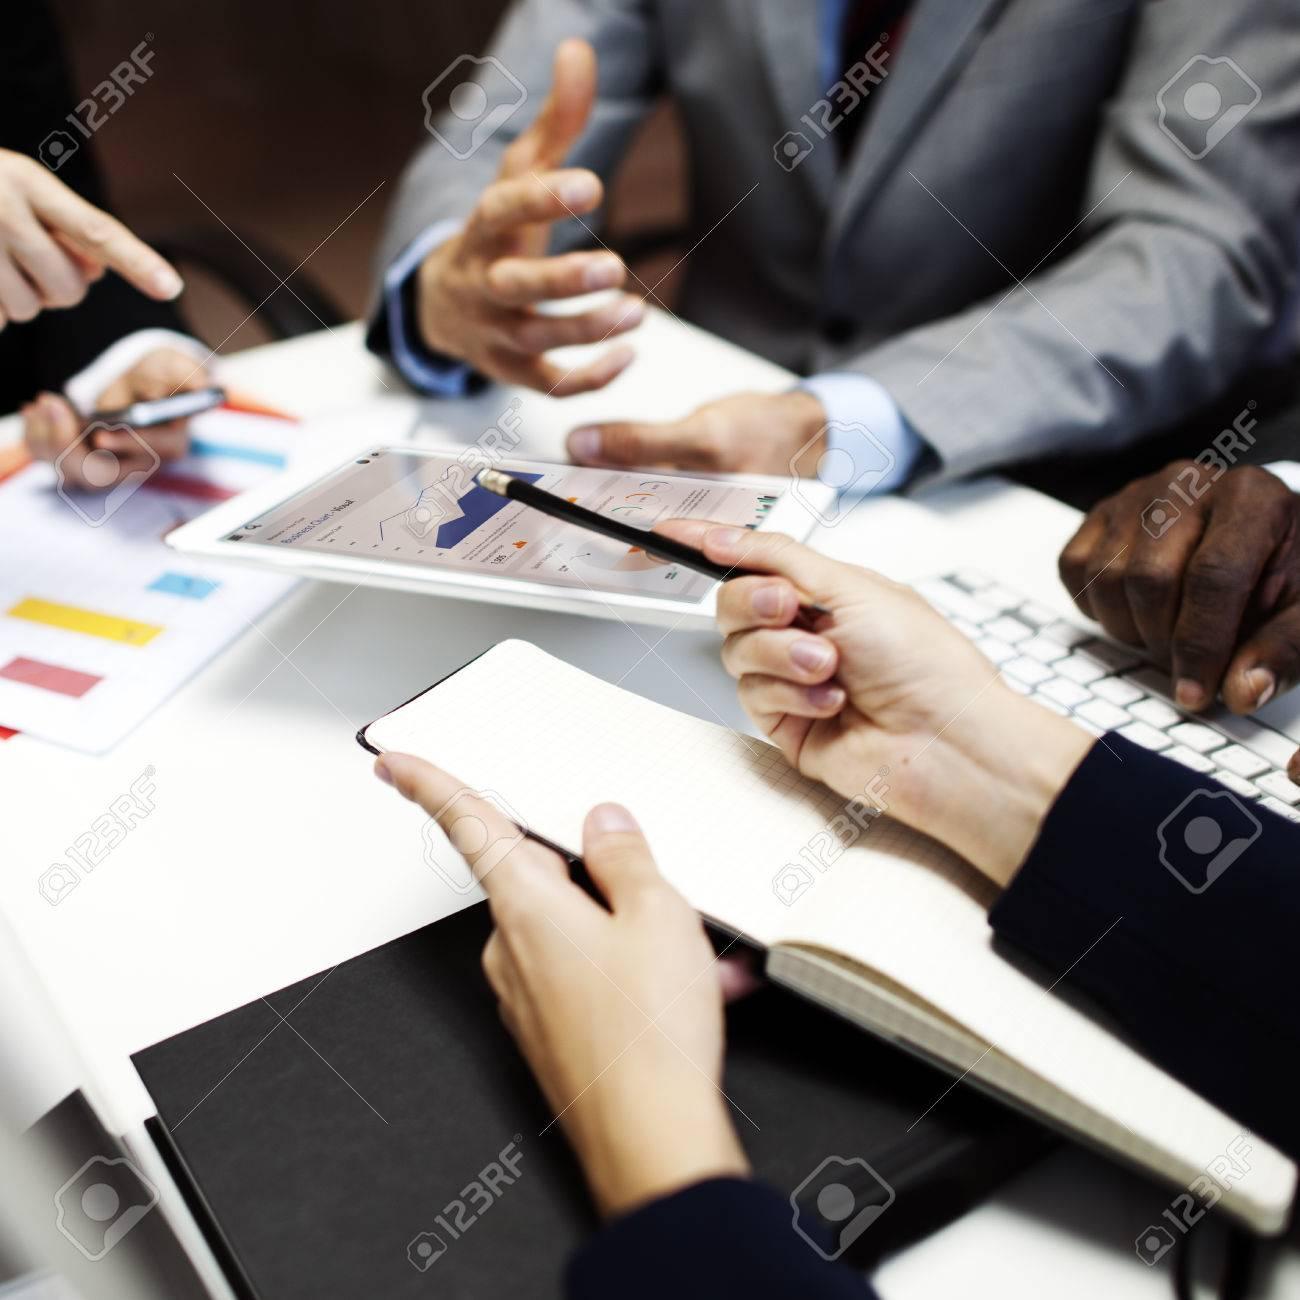 Business Team Corporate Organization Meeting Concept - 51687935